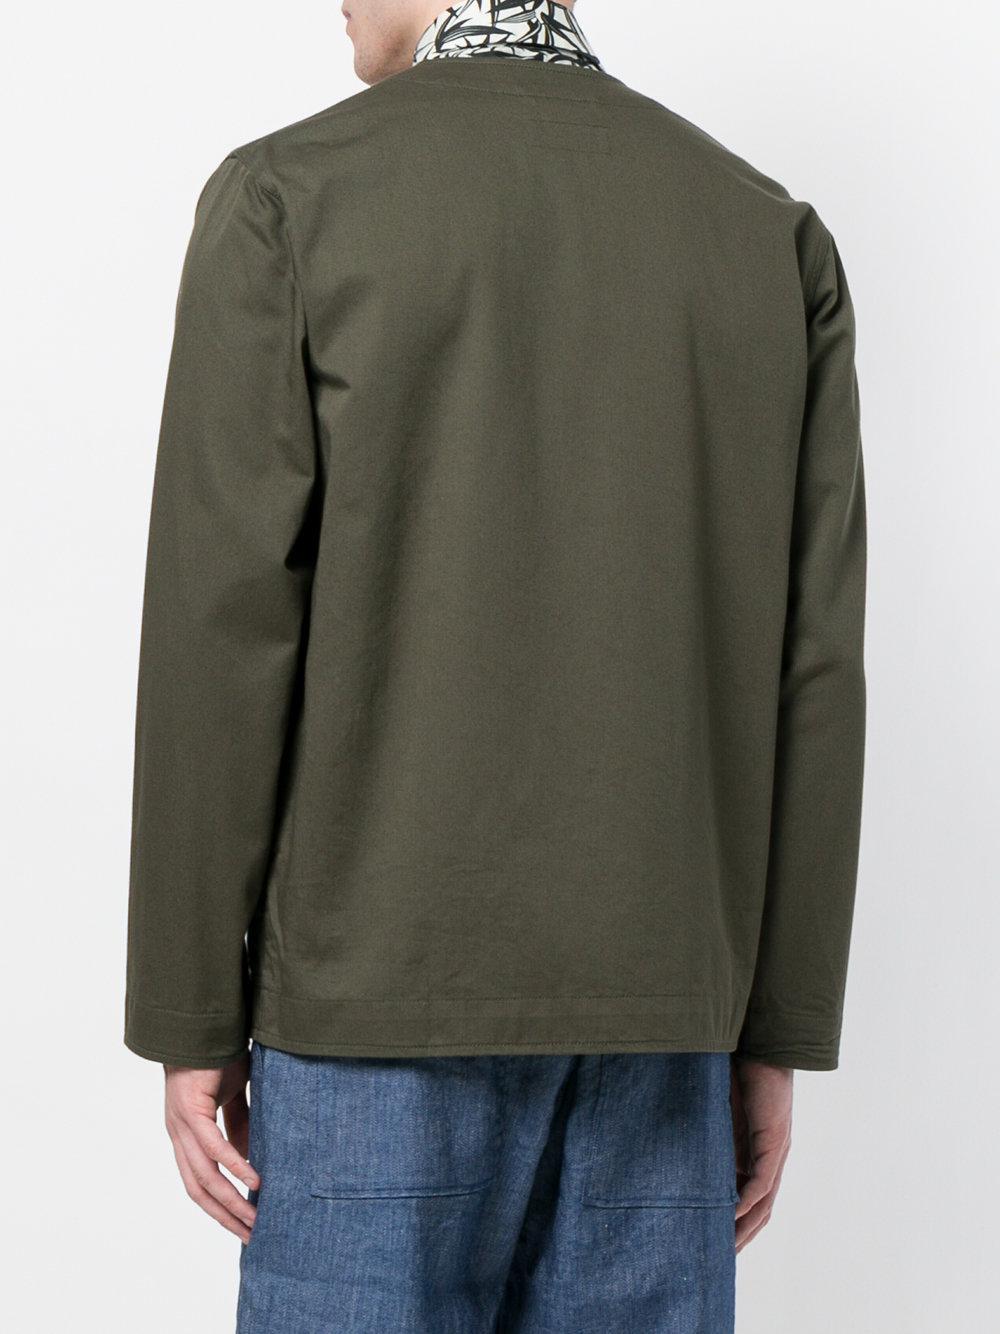 Universal Works Cotton Cabin Lightweight Jacket in Green for Men